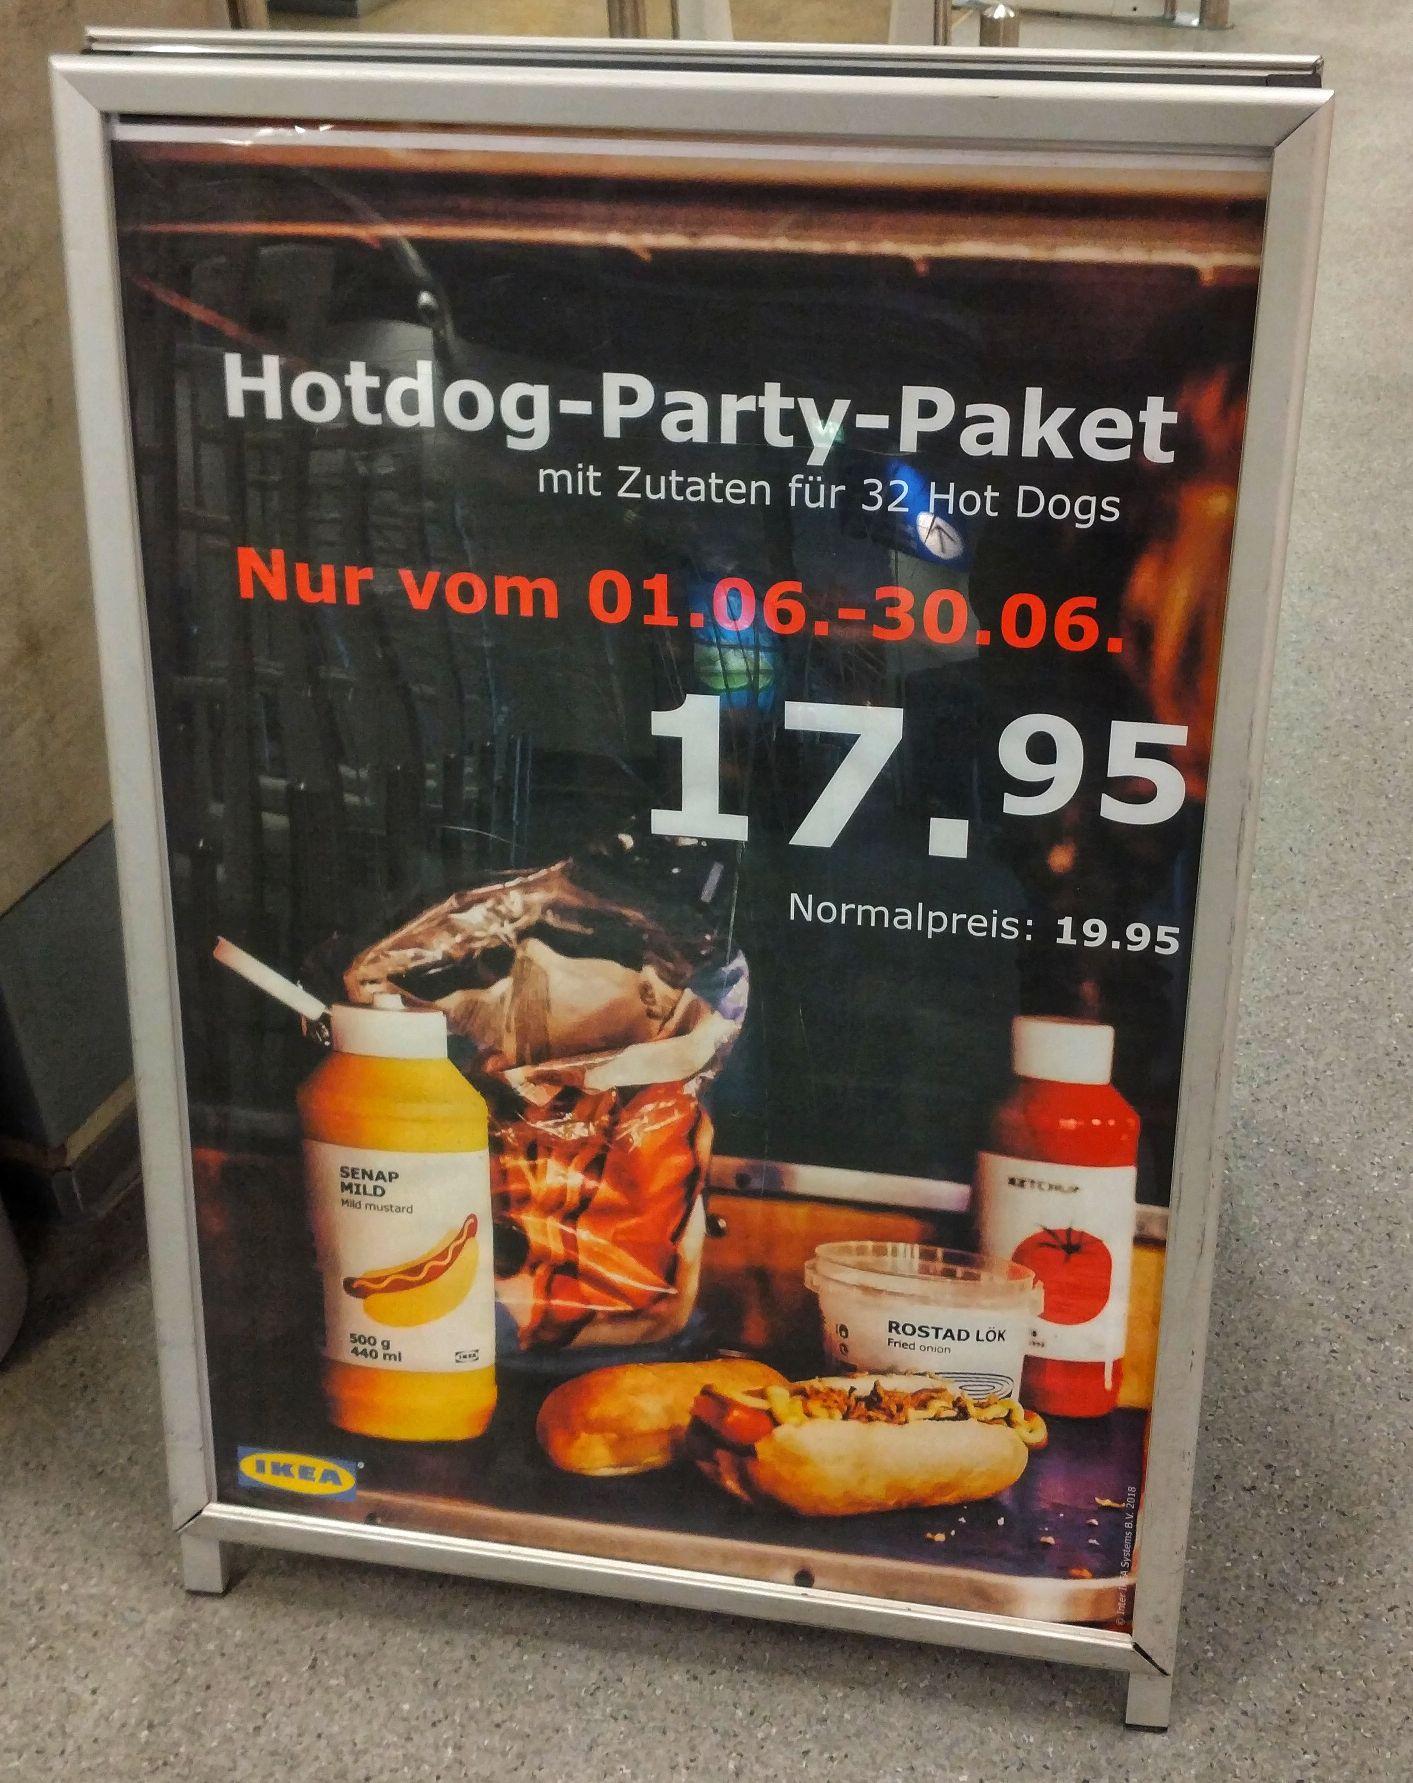 [Lokal/ Rostock] Ikea Hotdog-Party-Paket